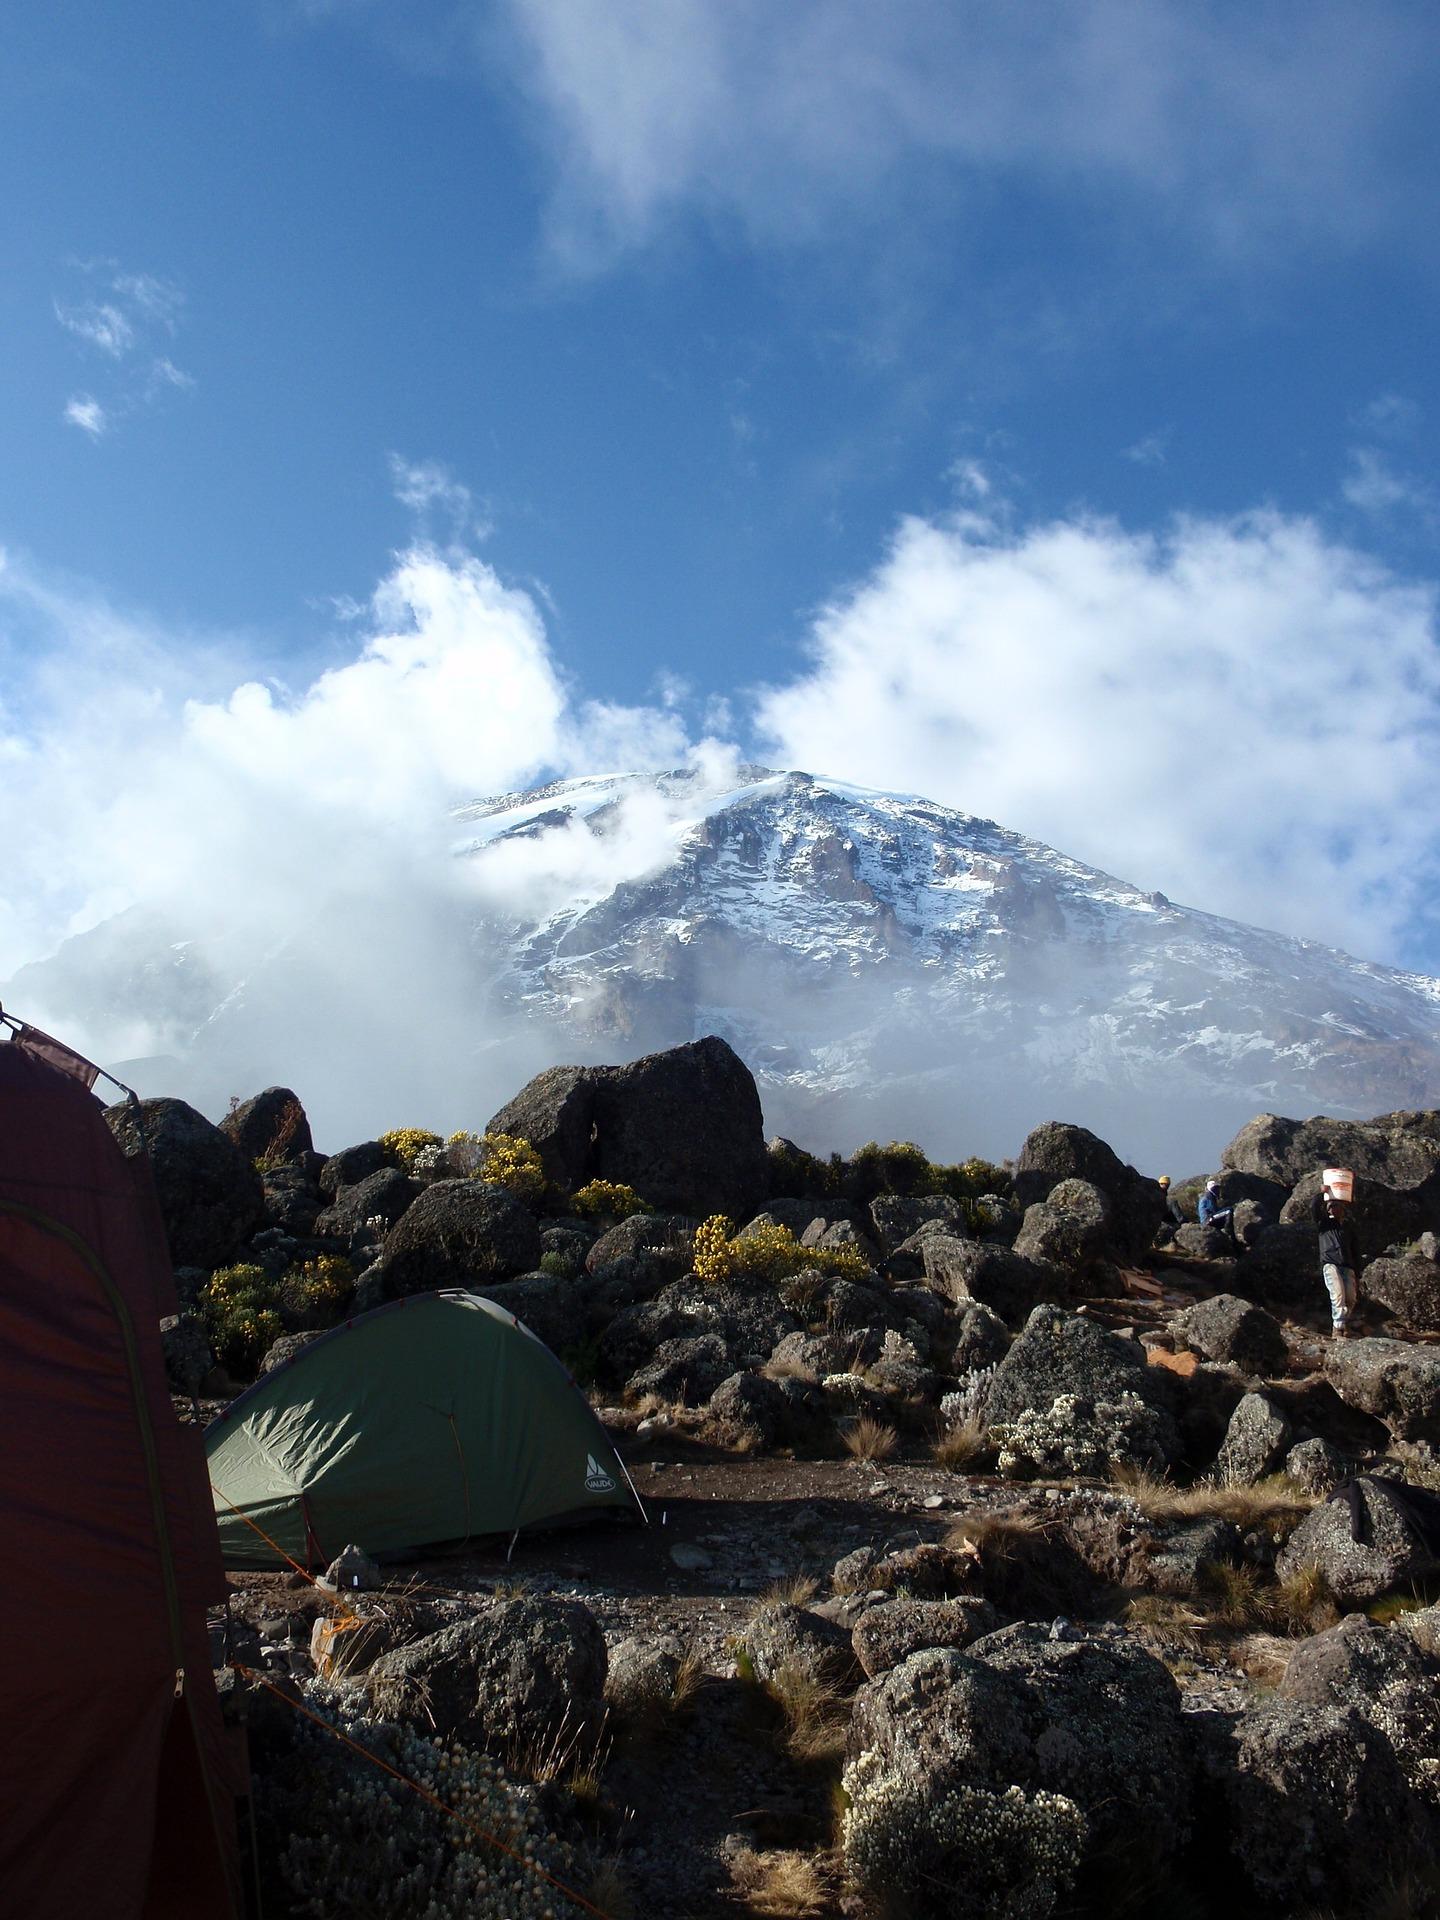 kilimanjaro-944311_1920